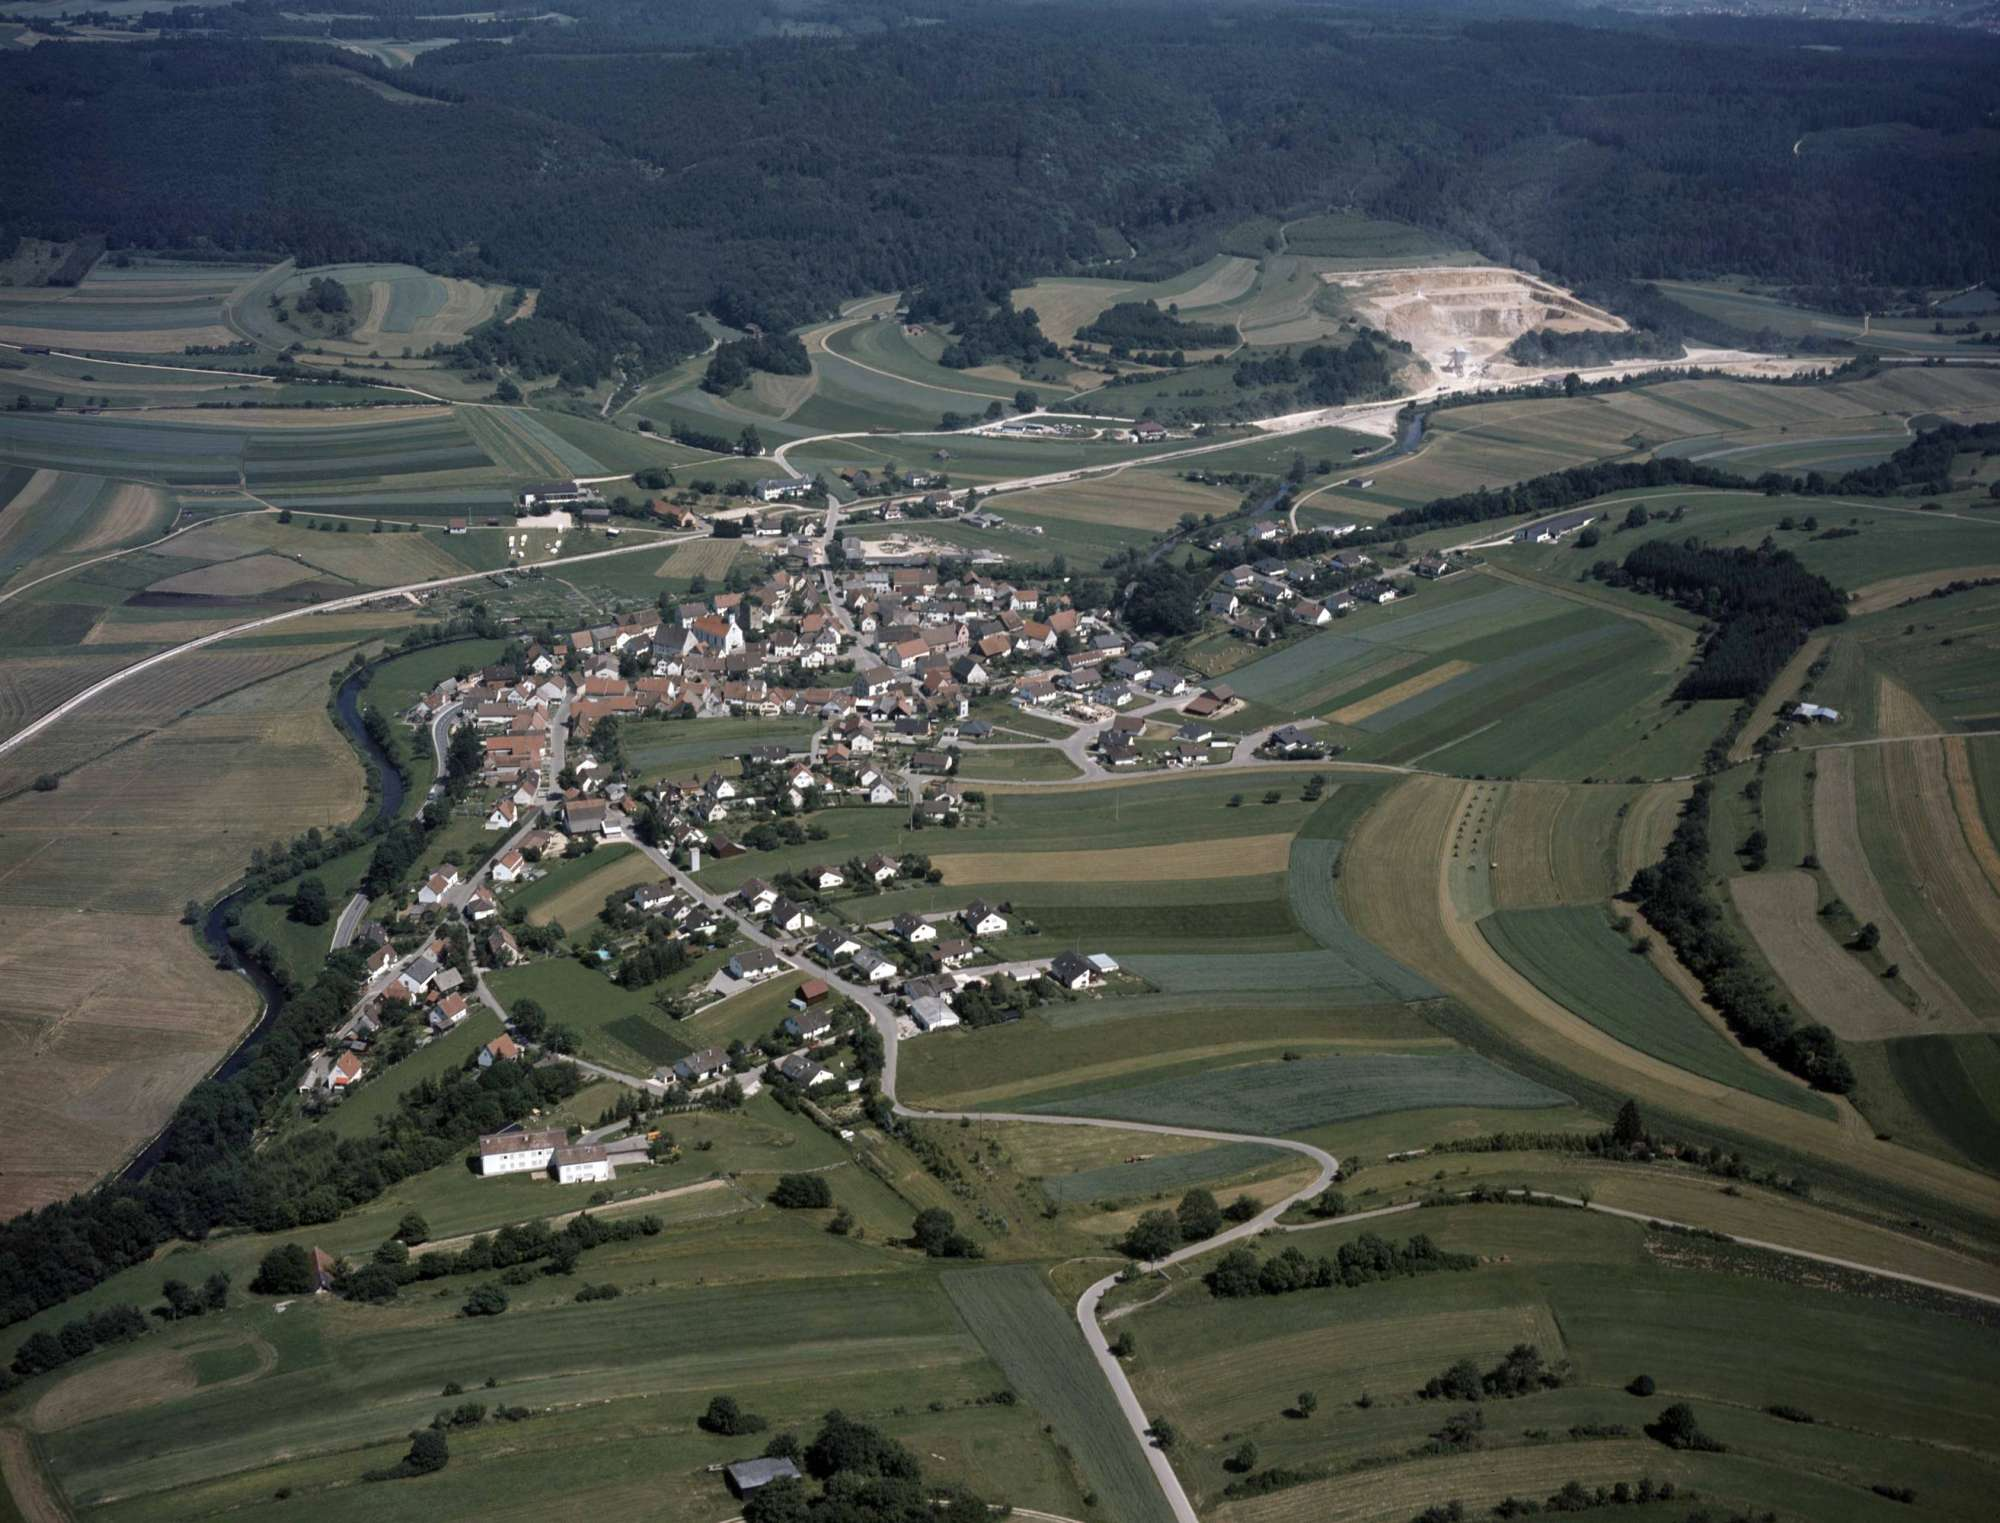 Jungnau, Luftbild, Bild 1